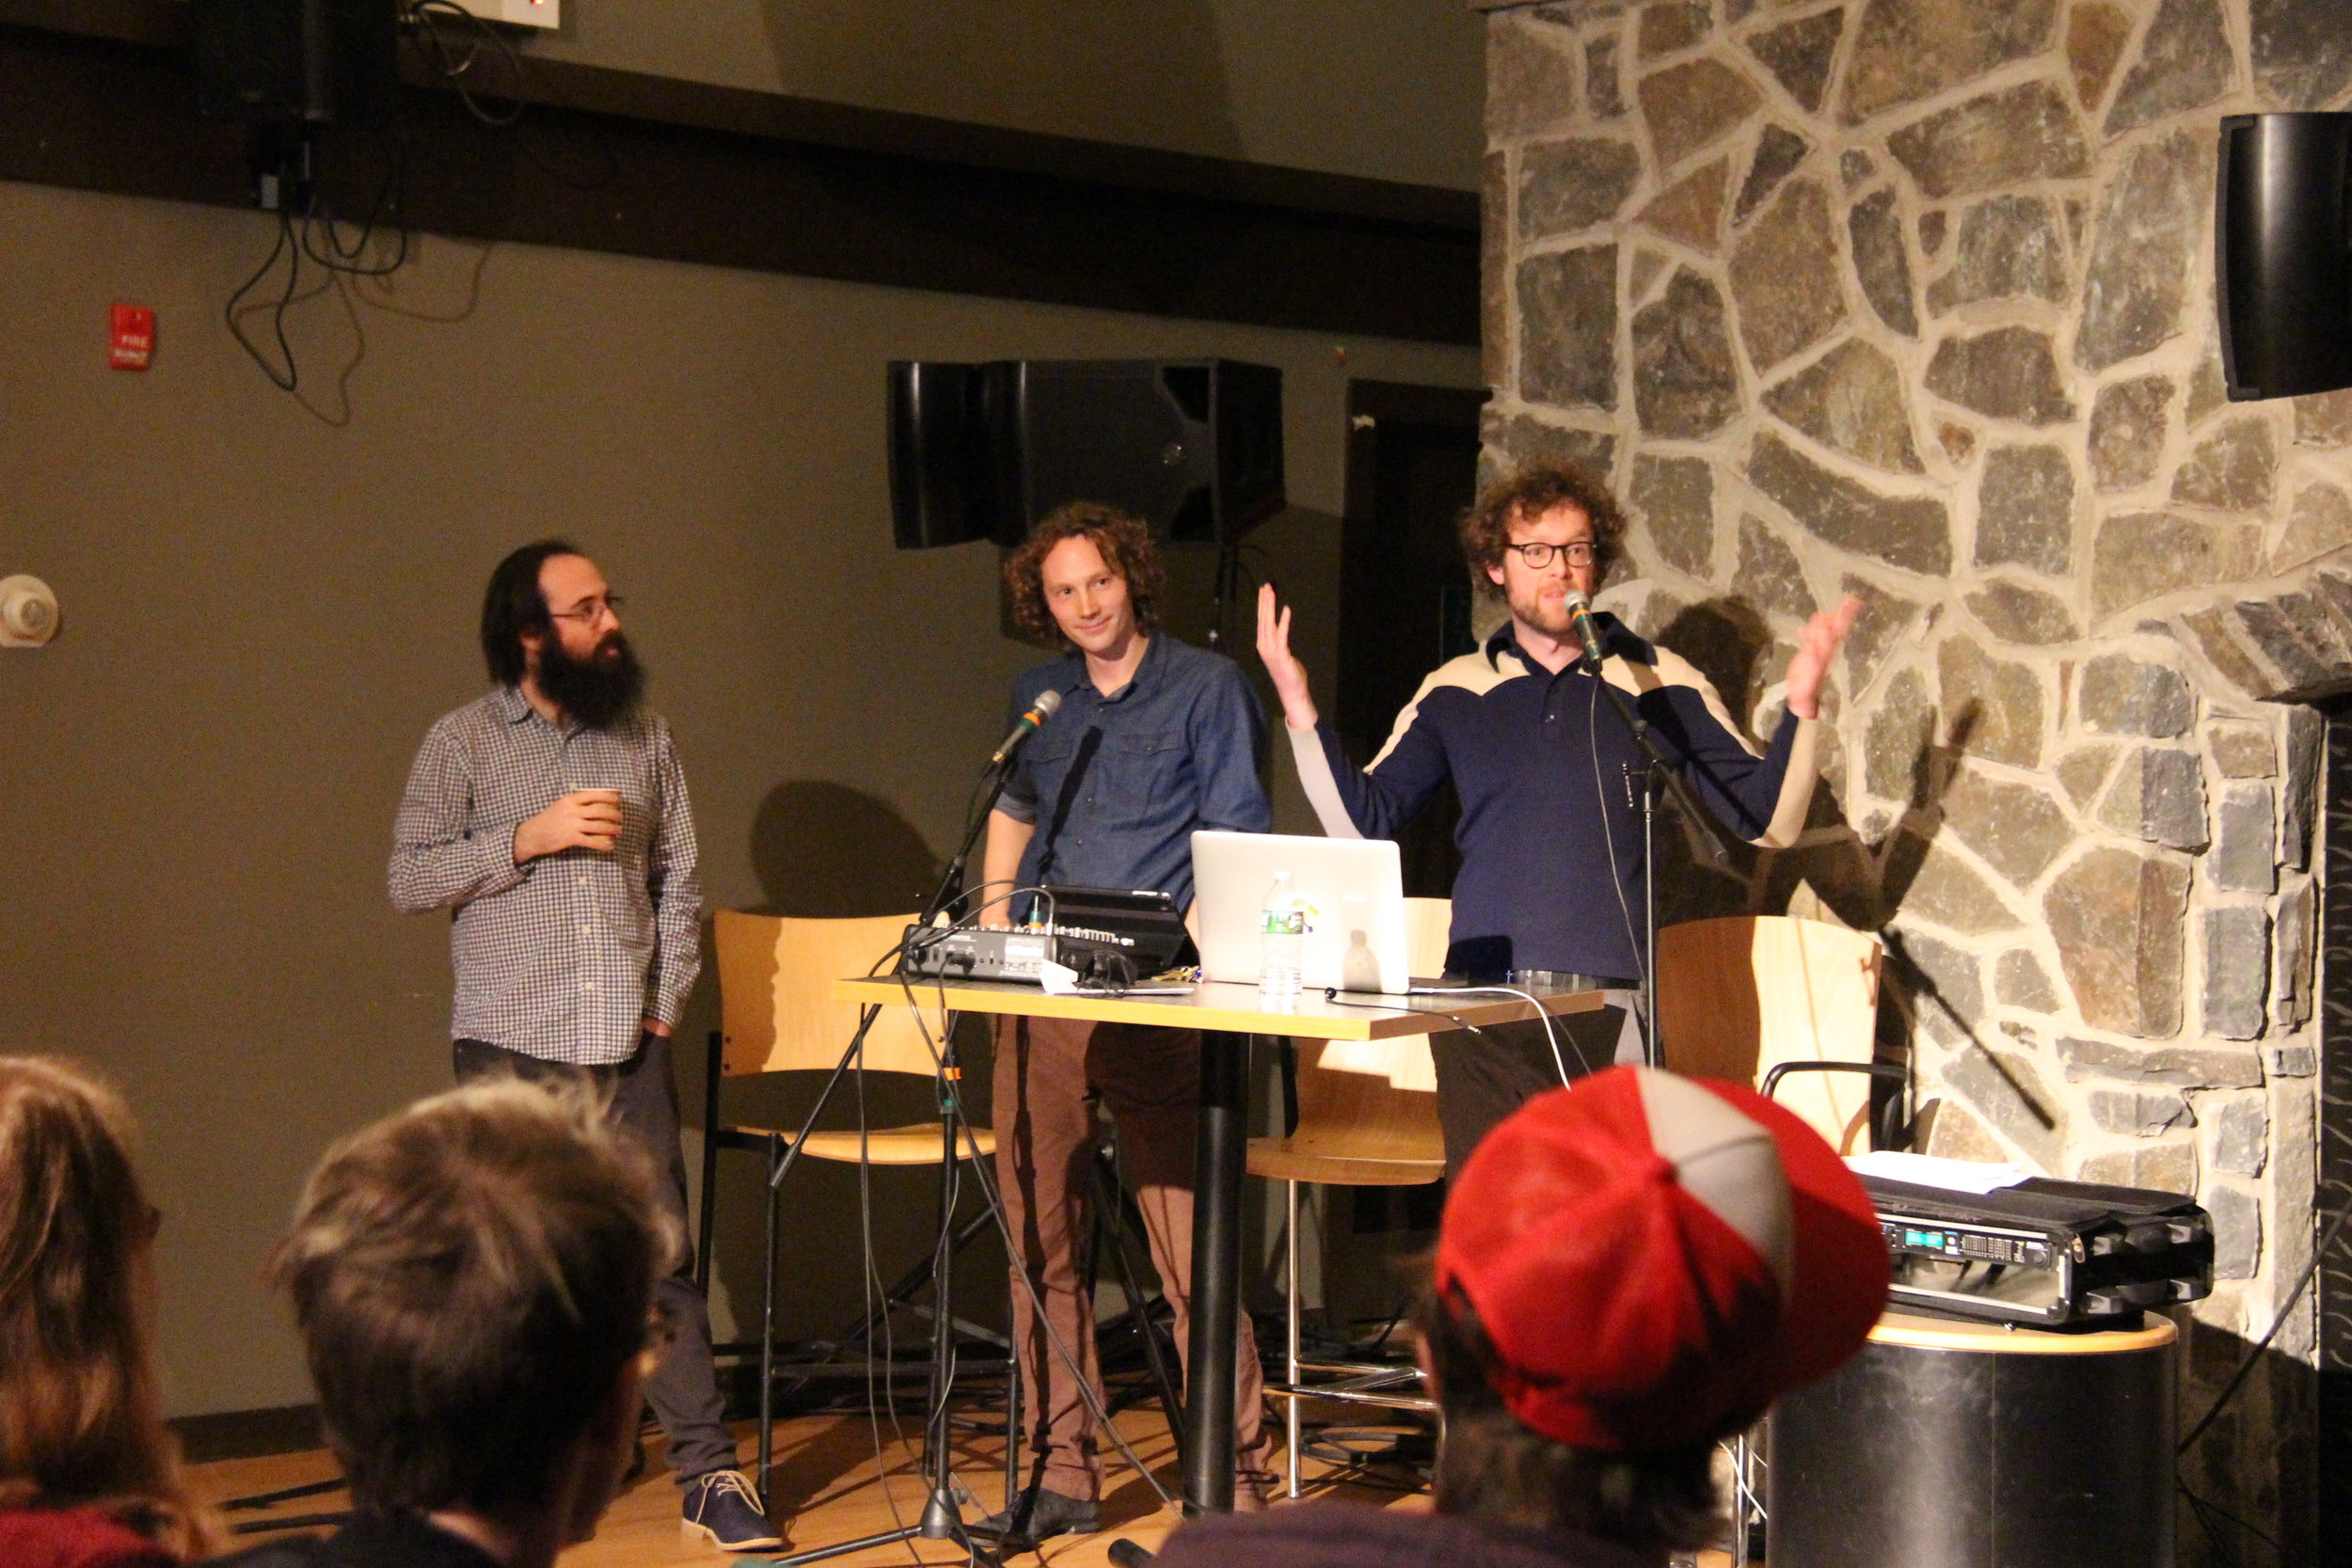 Adam Tinkle (MDOCS/MFS faculty), Sam Harnett, and Chris Hoff